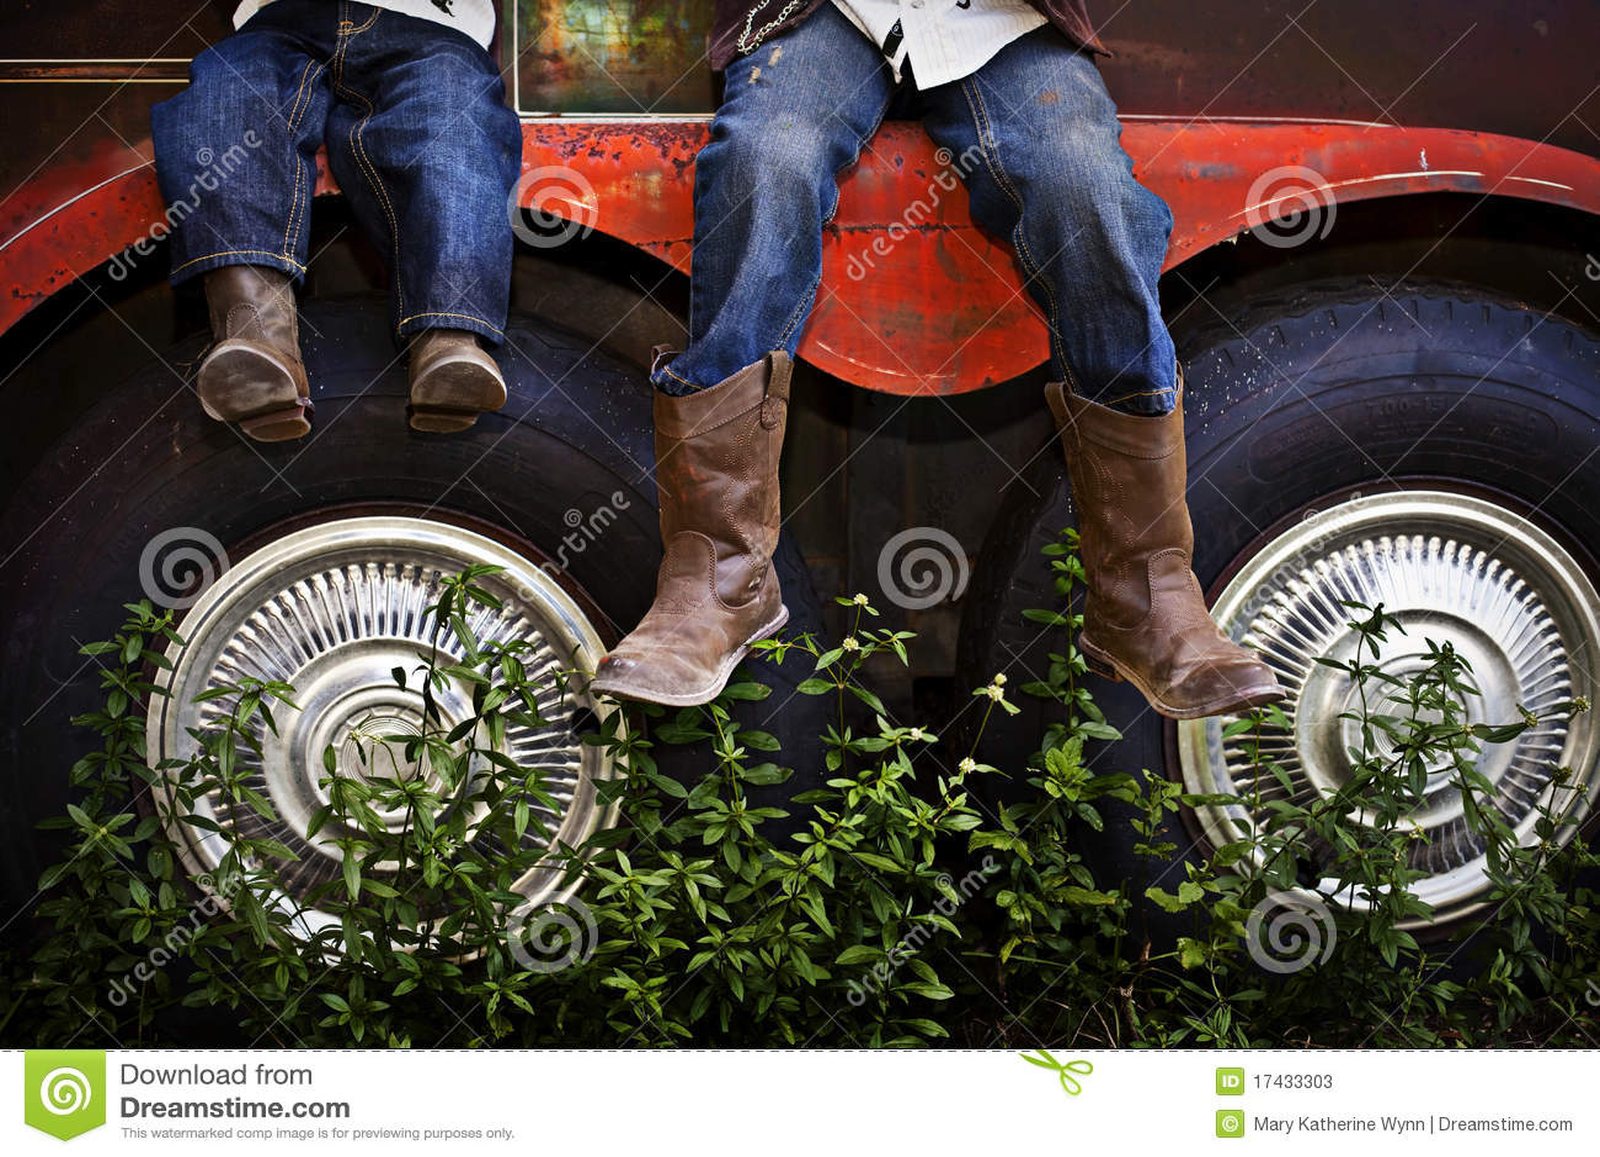 Boys wearing Cowboy Boots